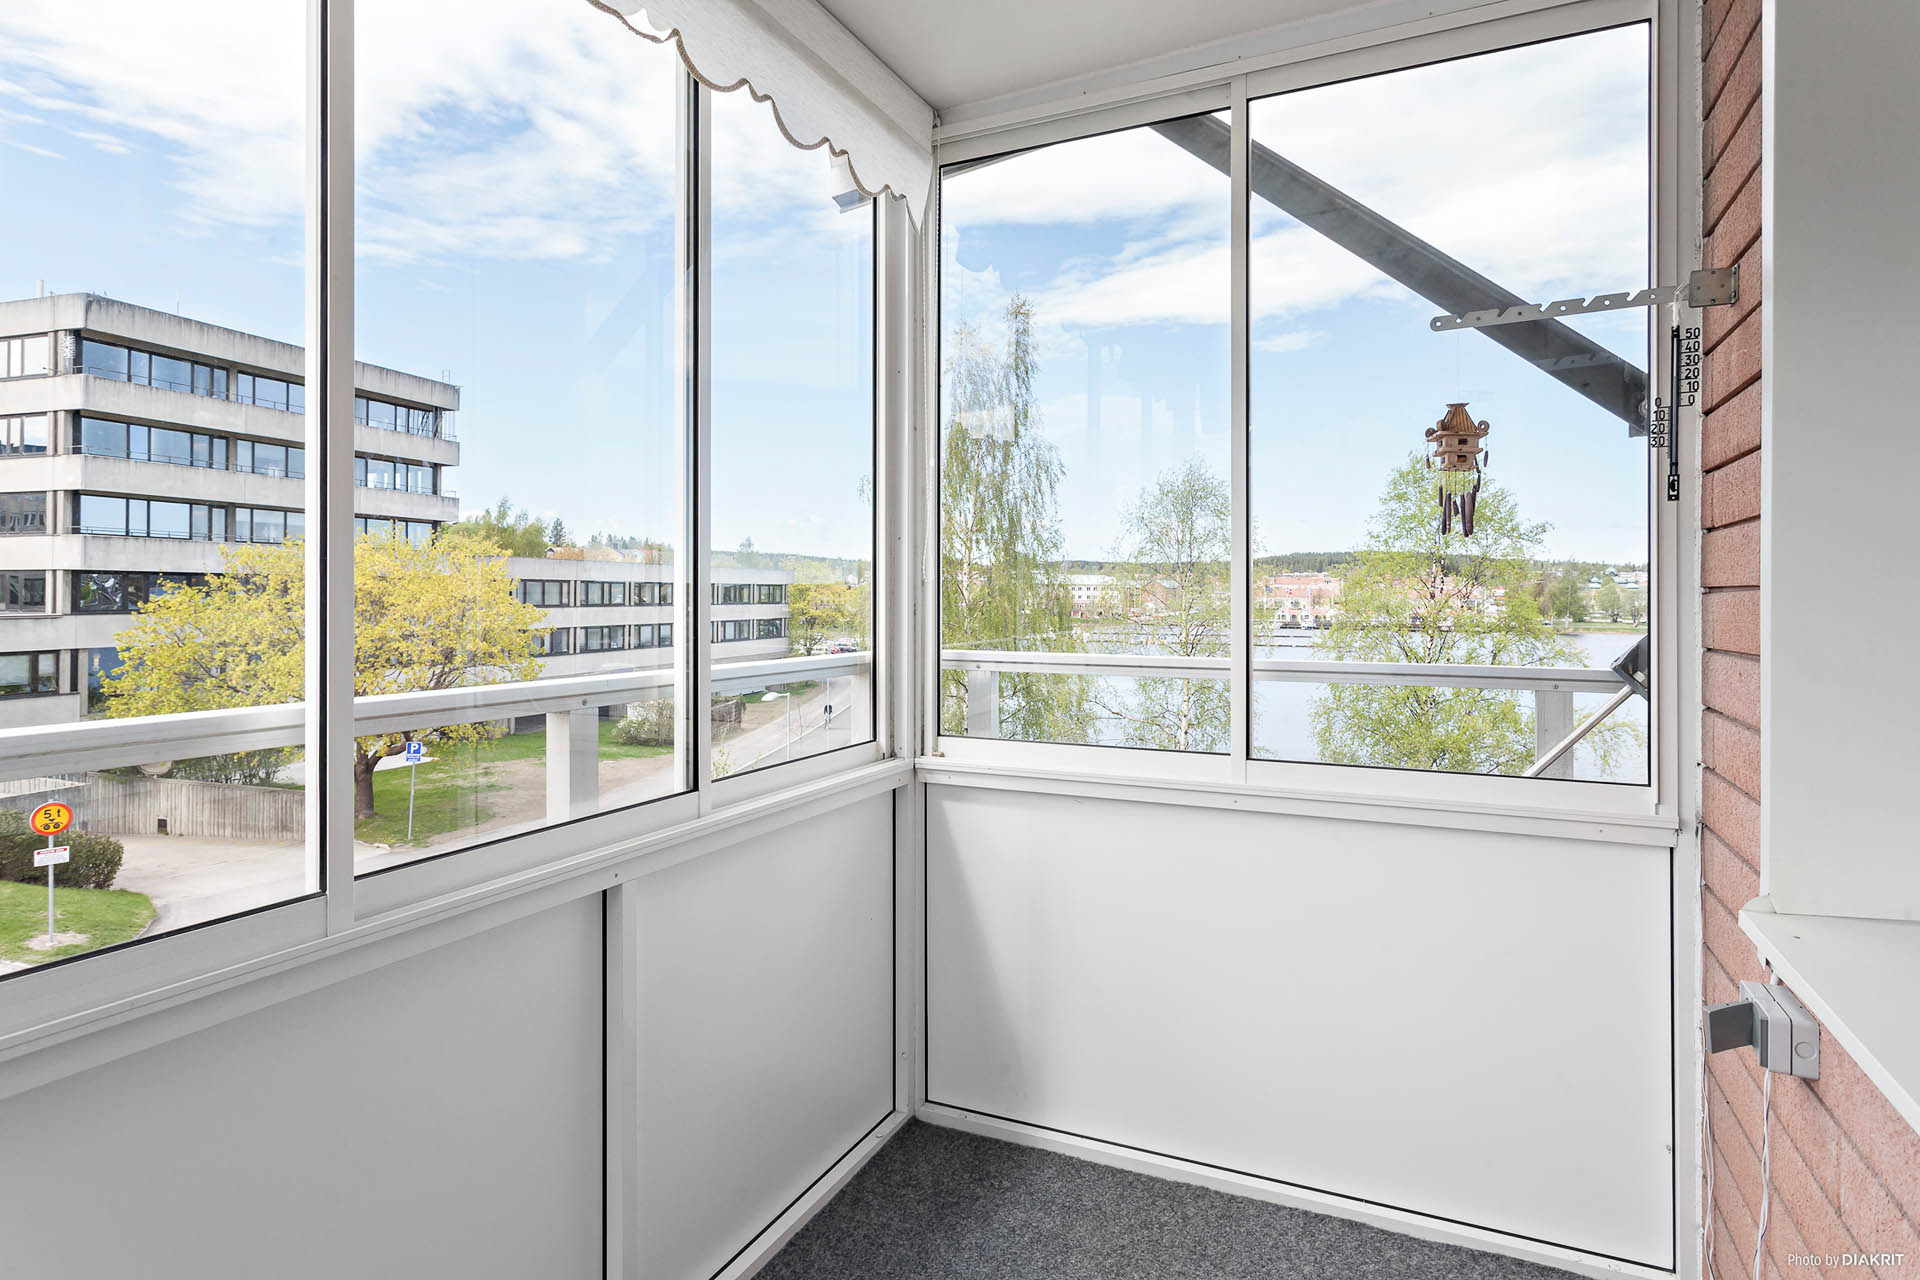 Inglasad balkong med fin utsikt.